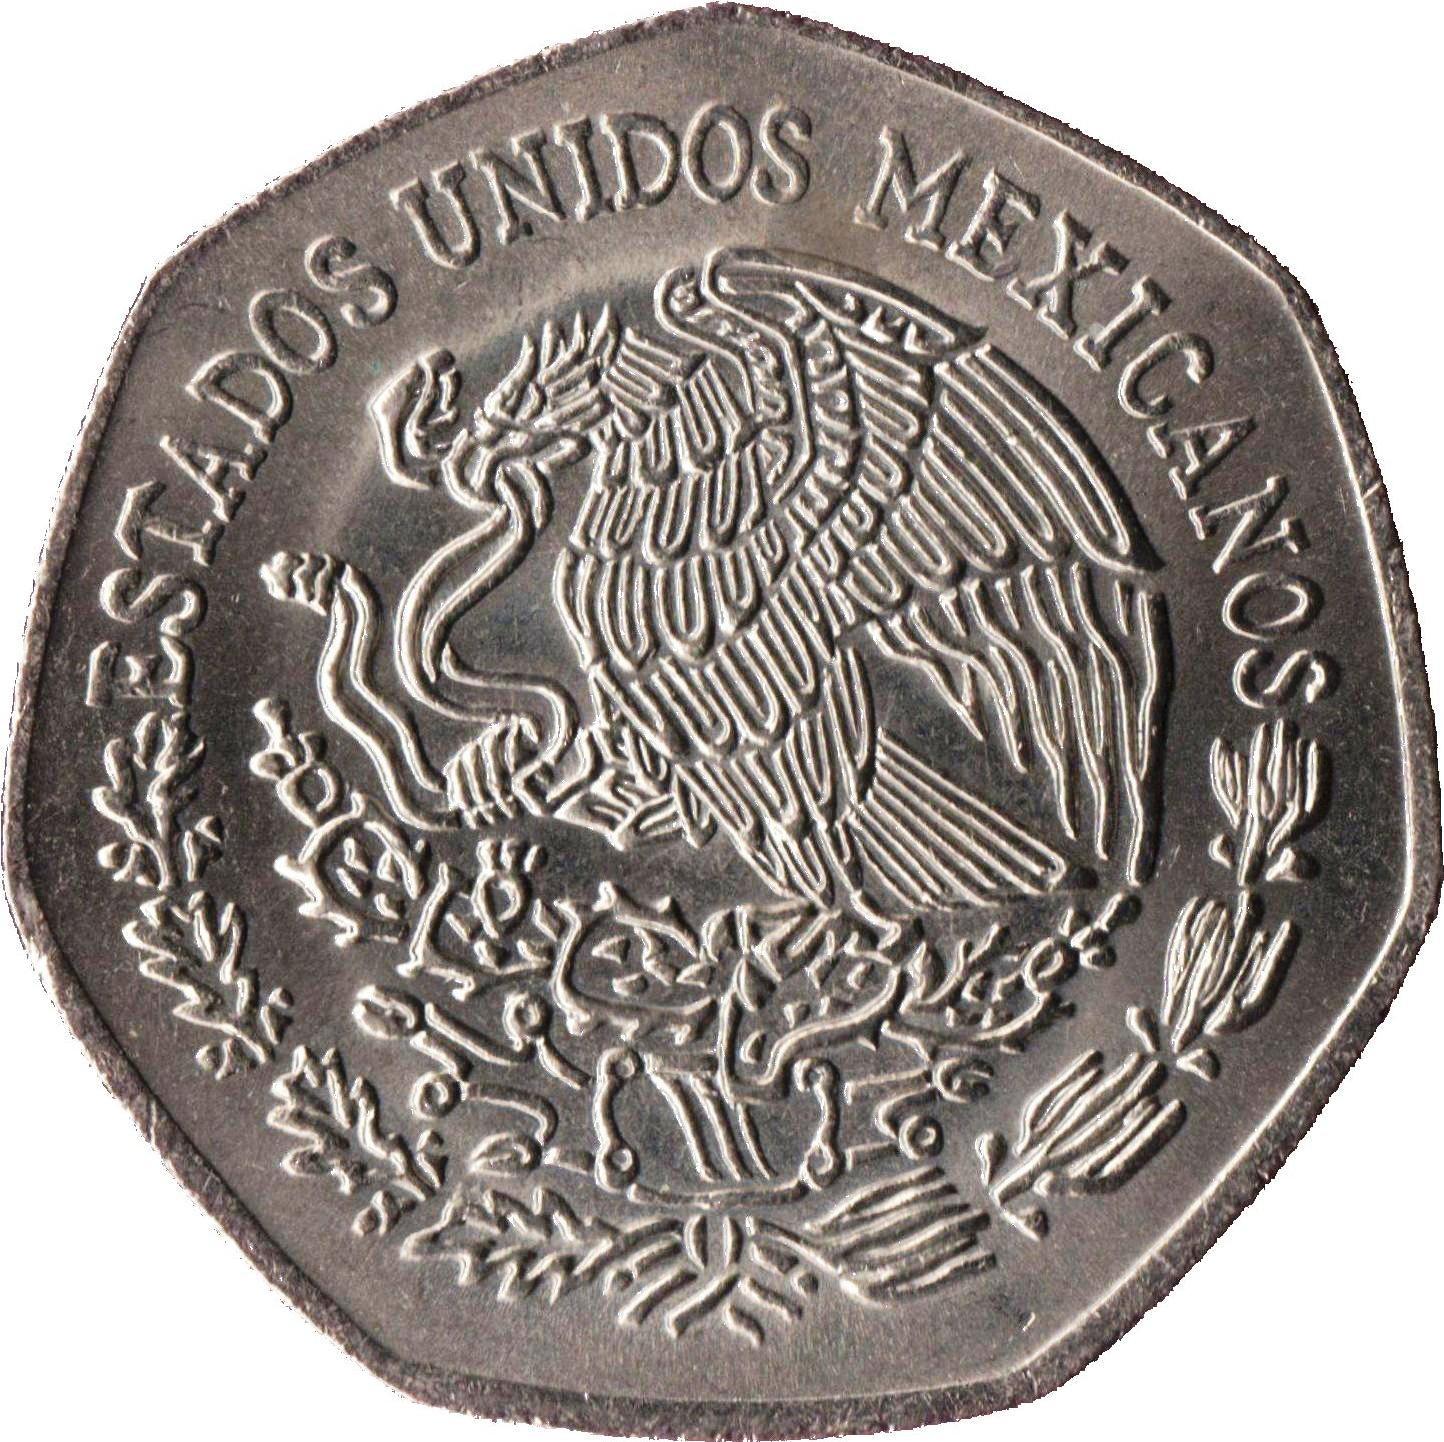 Mexico 10 Pesos (1974-1985)